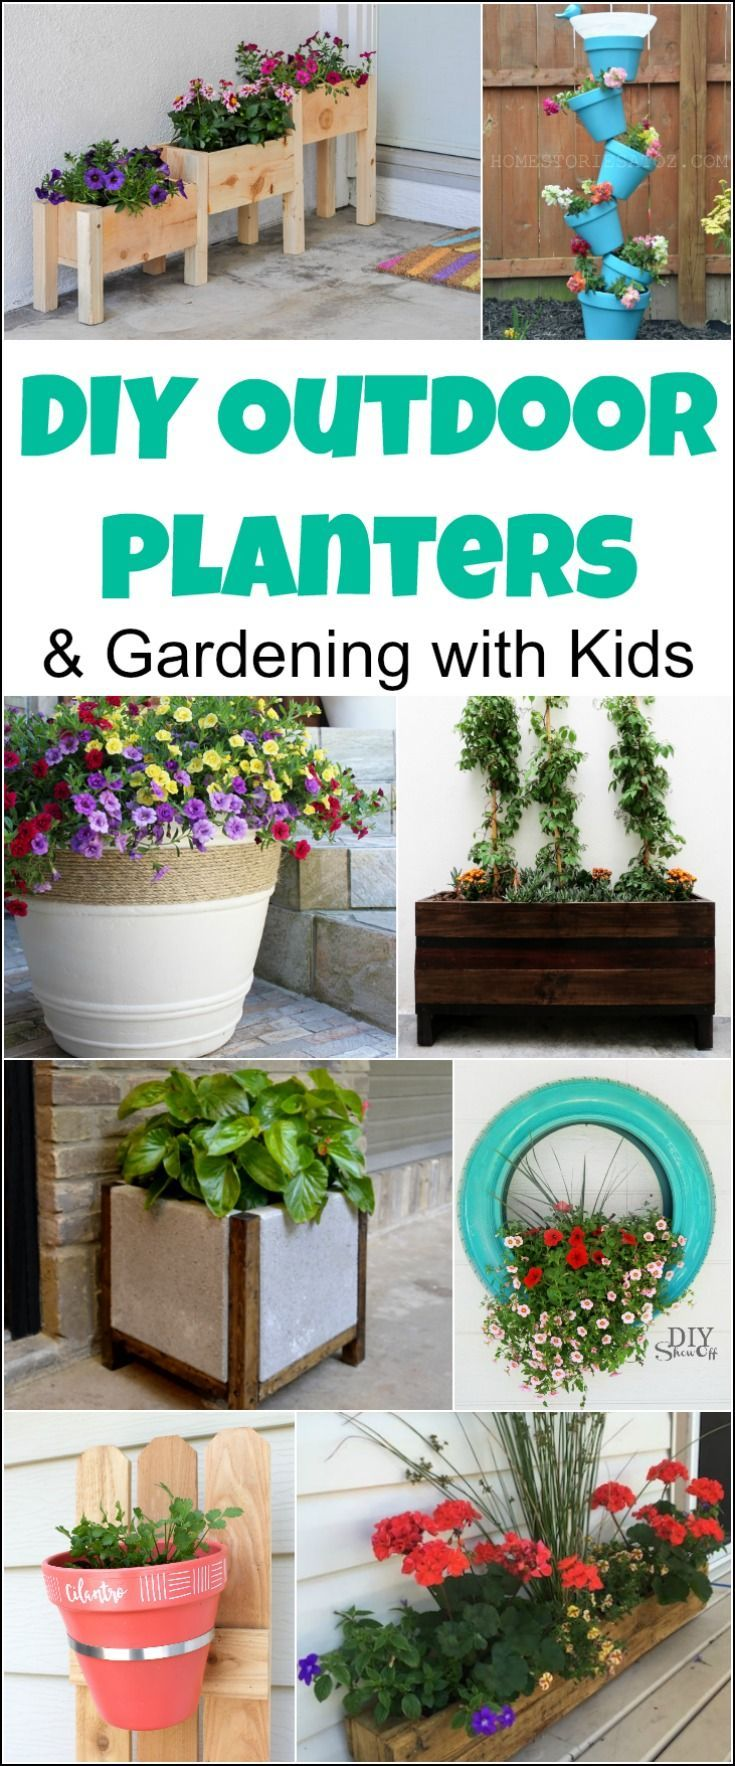 Gardening with Kids & 20 DIY Outdoor Planters